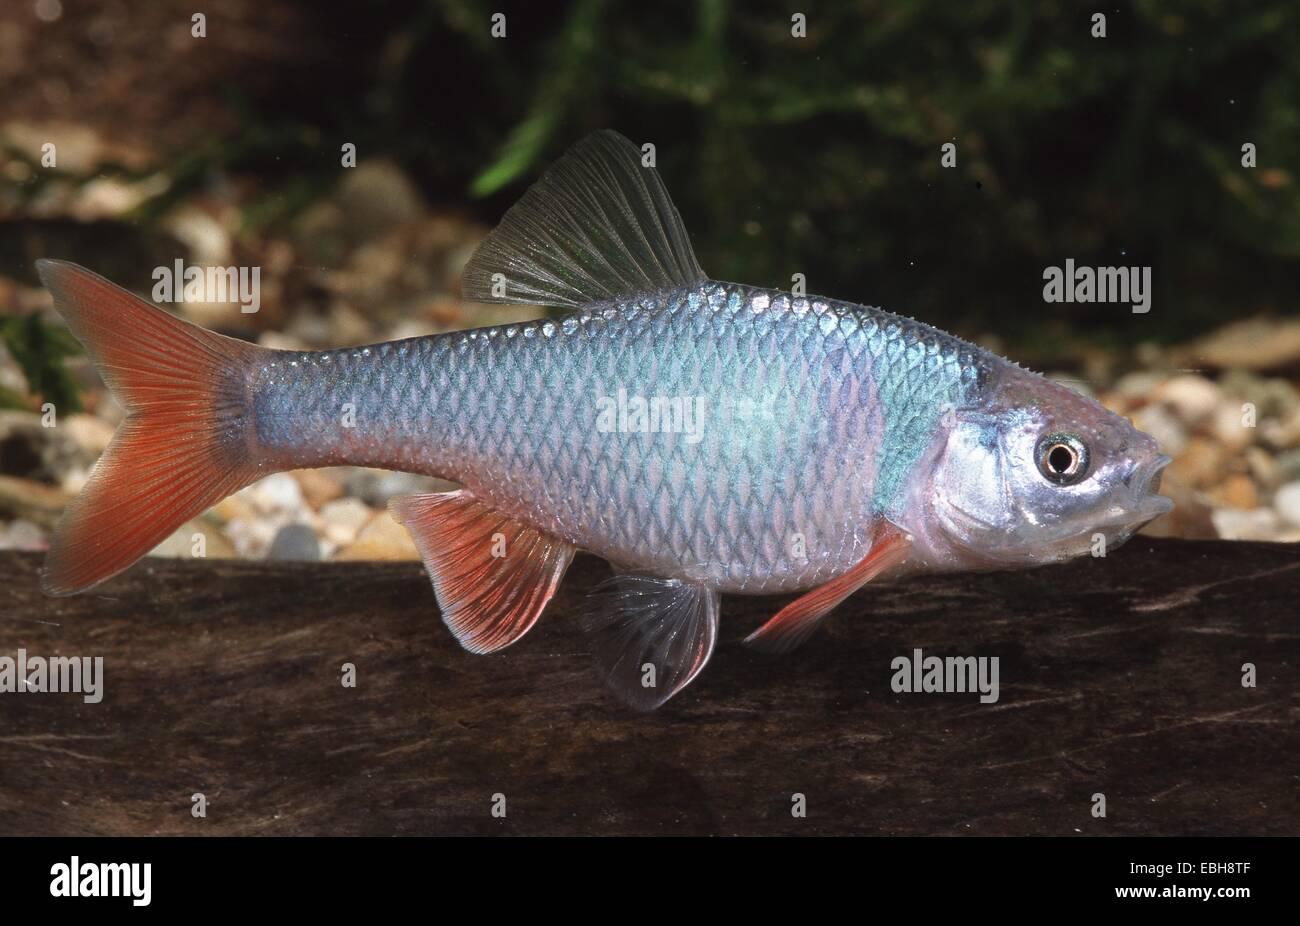 Shiner Fish Stock Photos & Shiner Fish Stock Images - Alamy